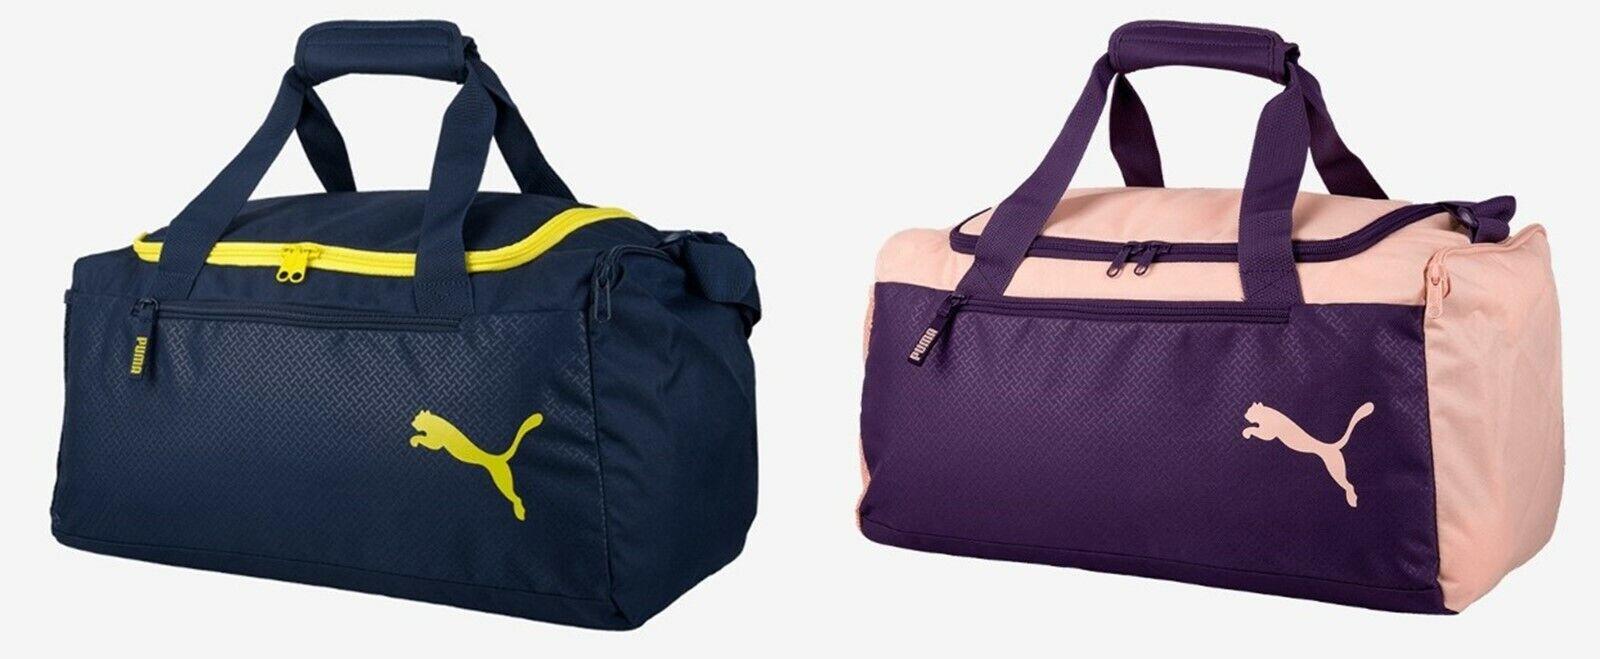 4bb9ca7d1 Puma Fundamental Small Training Duffel Bags Running Navy GYM Bag Sacks  07552706 | eBay